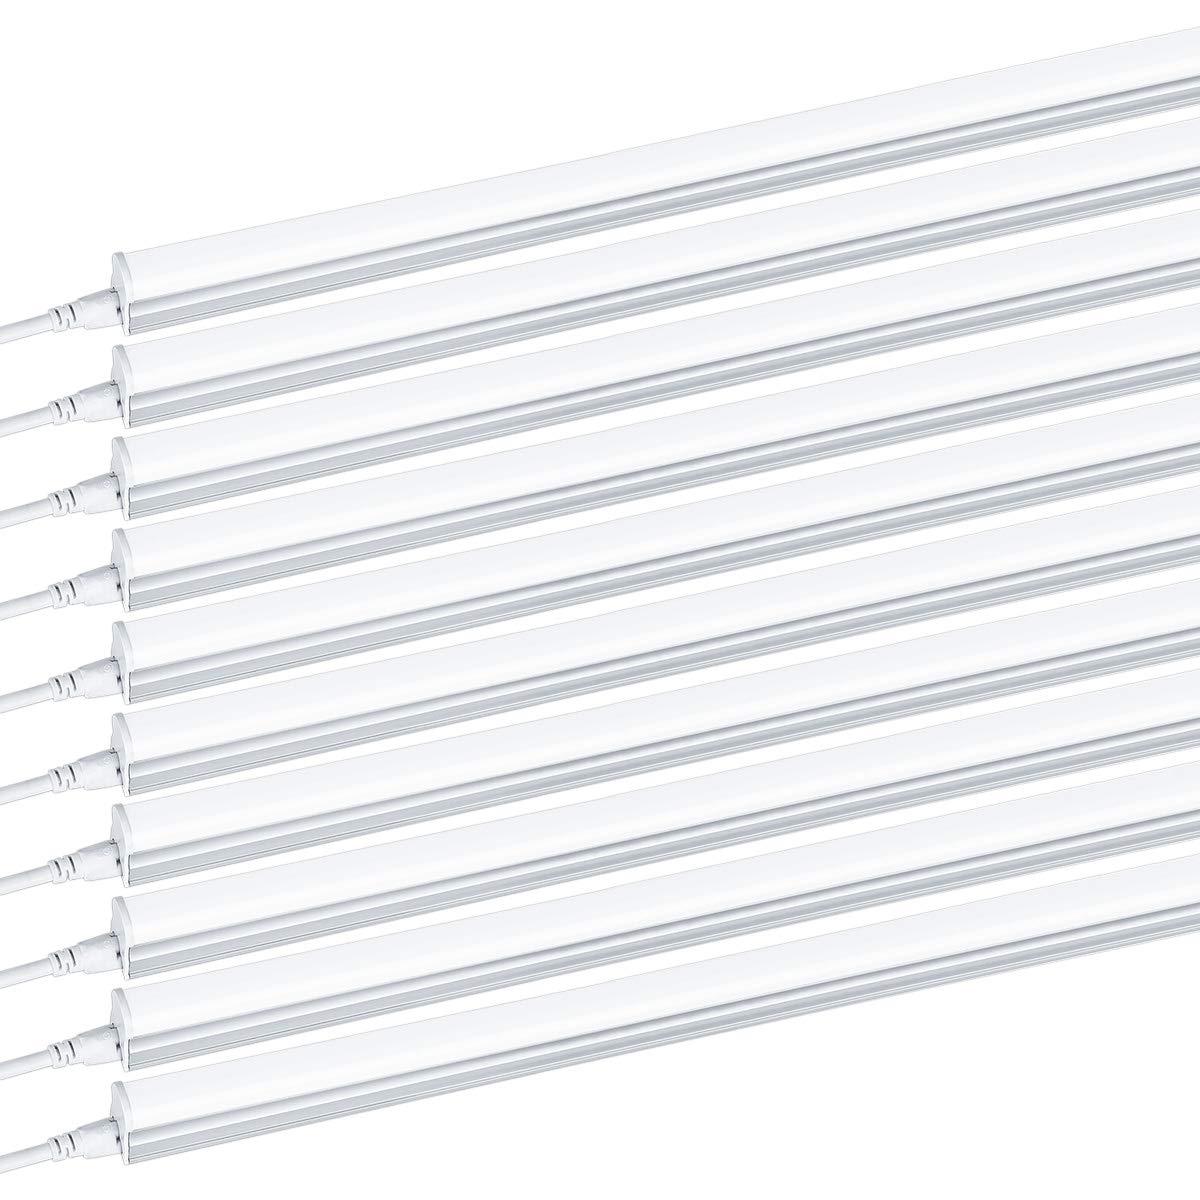 10 PACK T5 4FT Linkable LED Shop Light 6000K Daylight